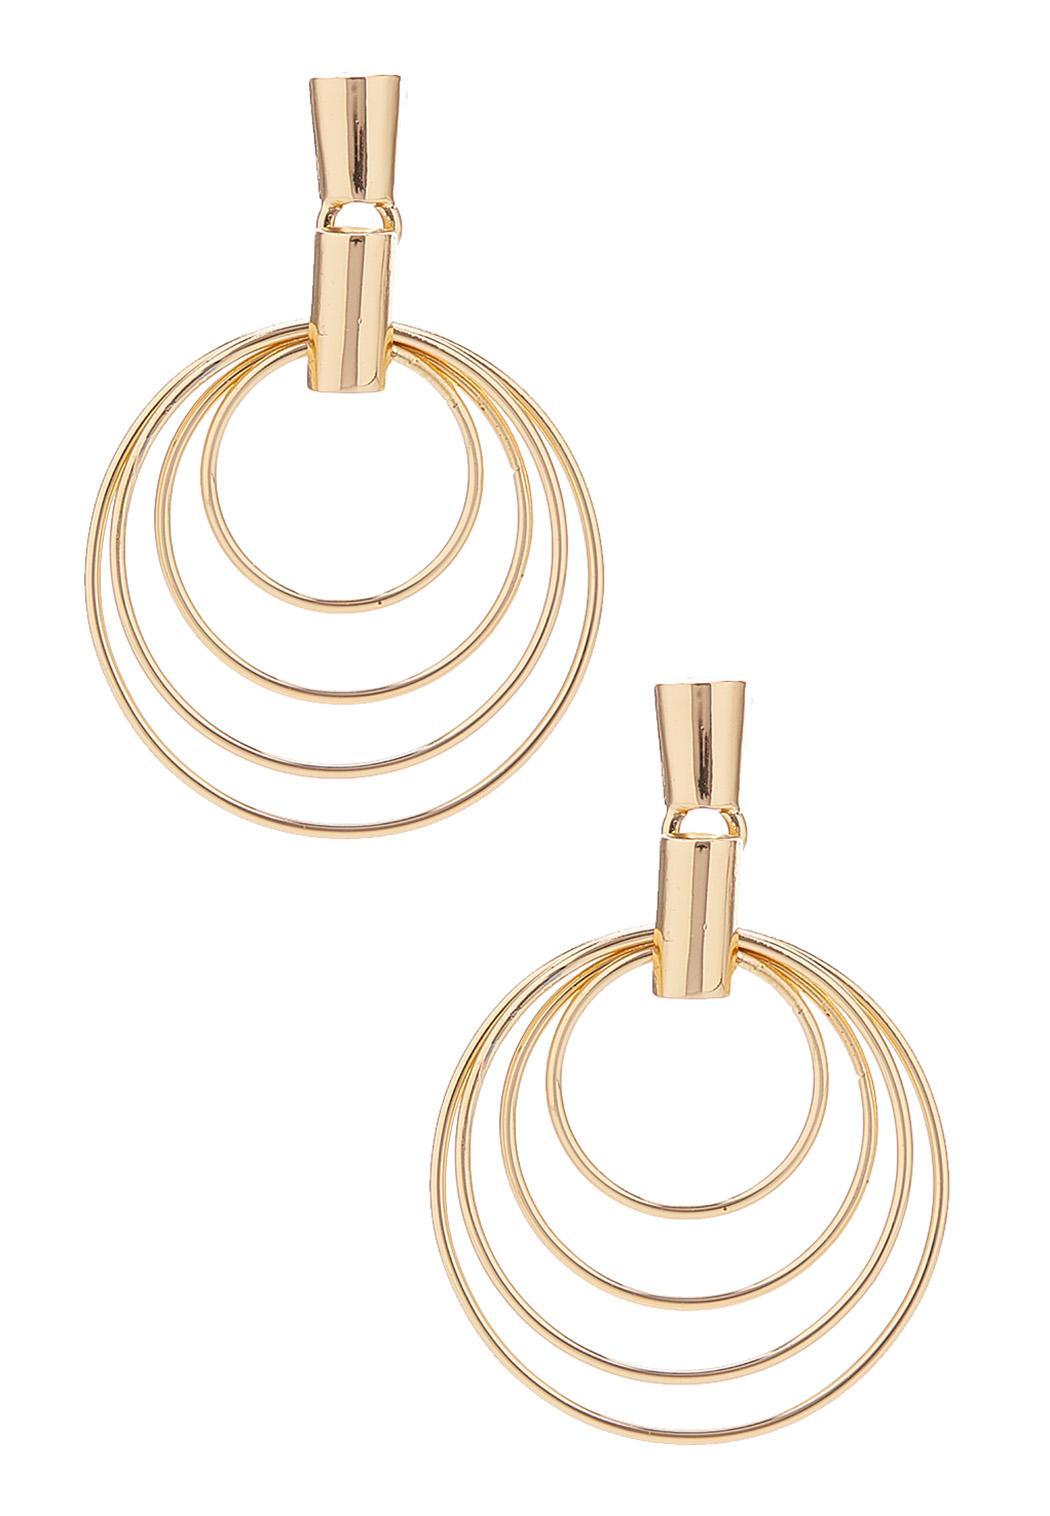 Layered Circle Earrings